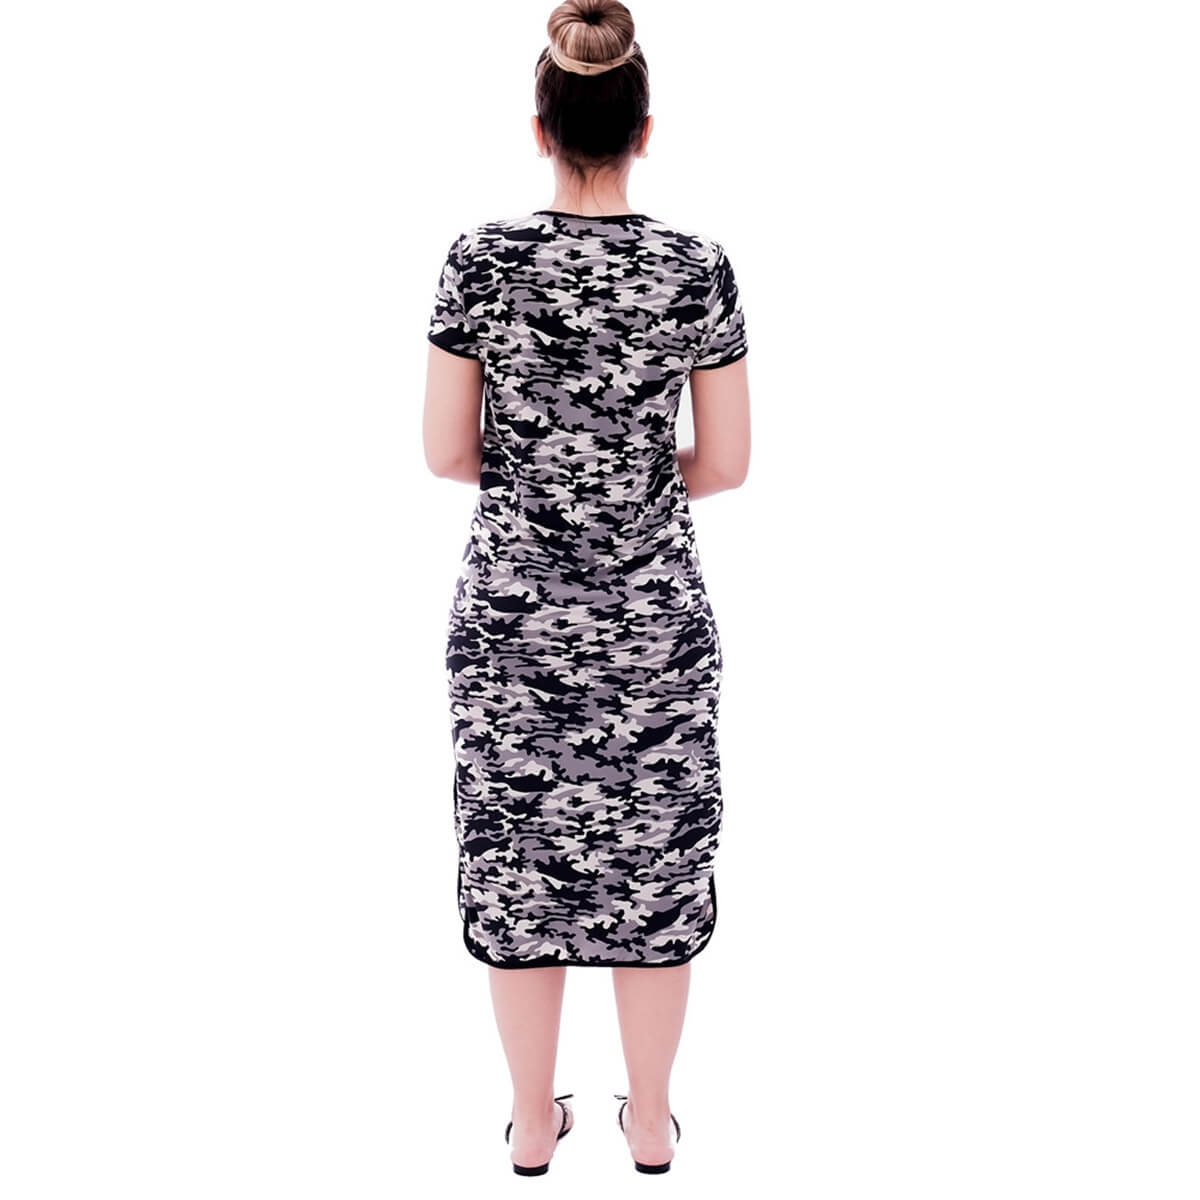 Camisola Feminina Midi Manga Curta 3 em 1 com Estampa Militar Camuflada e Viés Preto